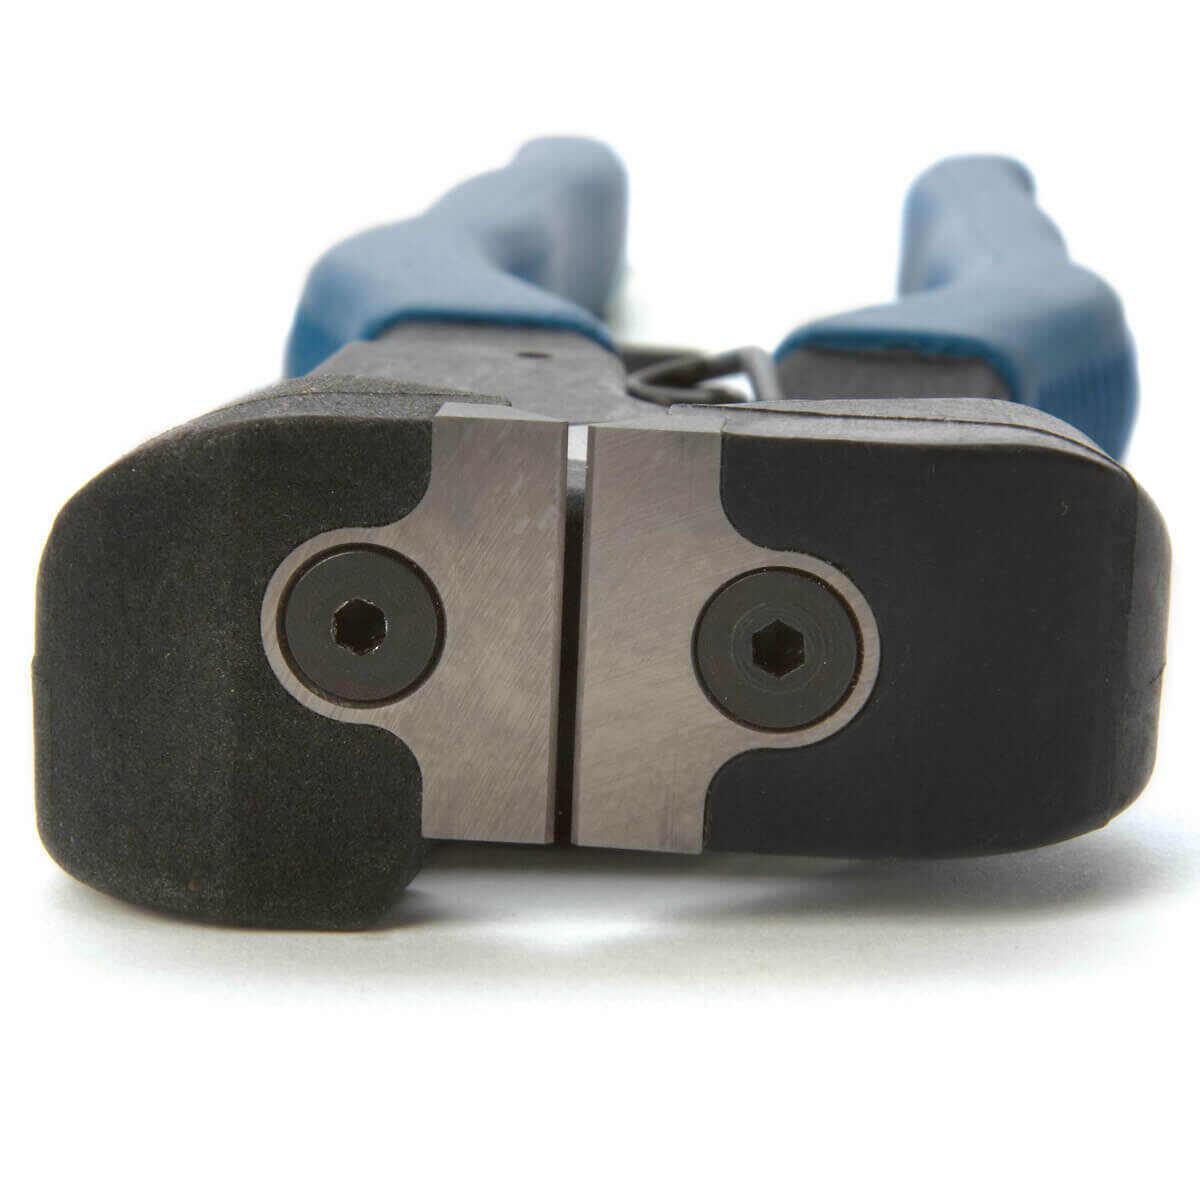 barwalt nippers replacement blades